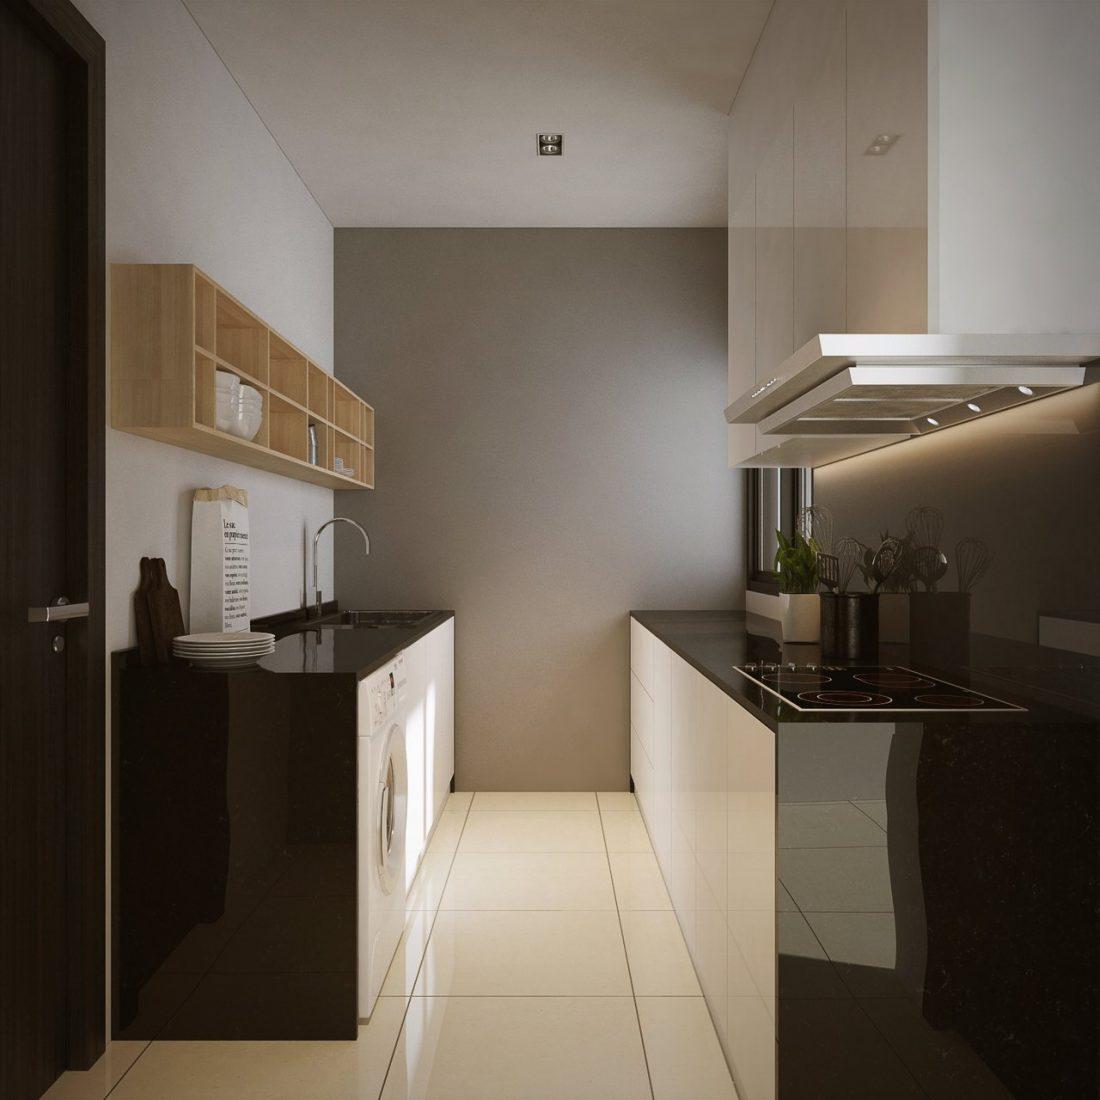 30 Kitchens From Malaysian Interior Designers: La Costa Kuala Lumpur